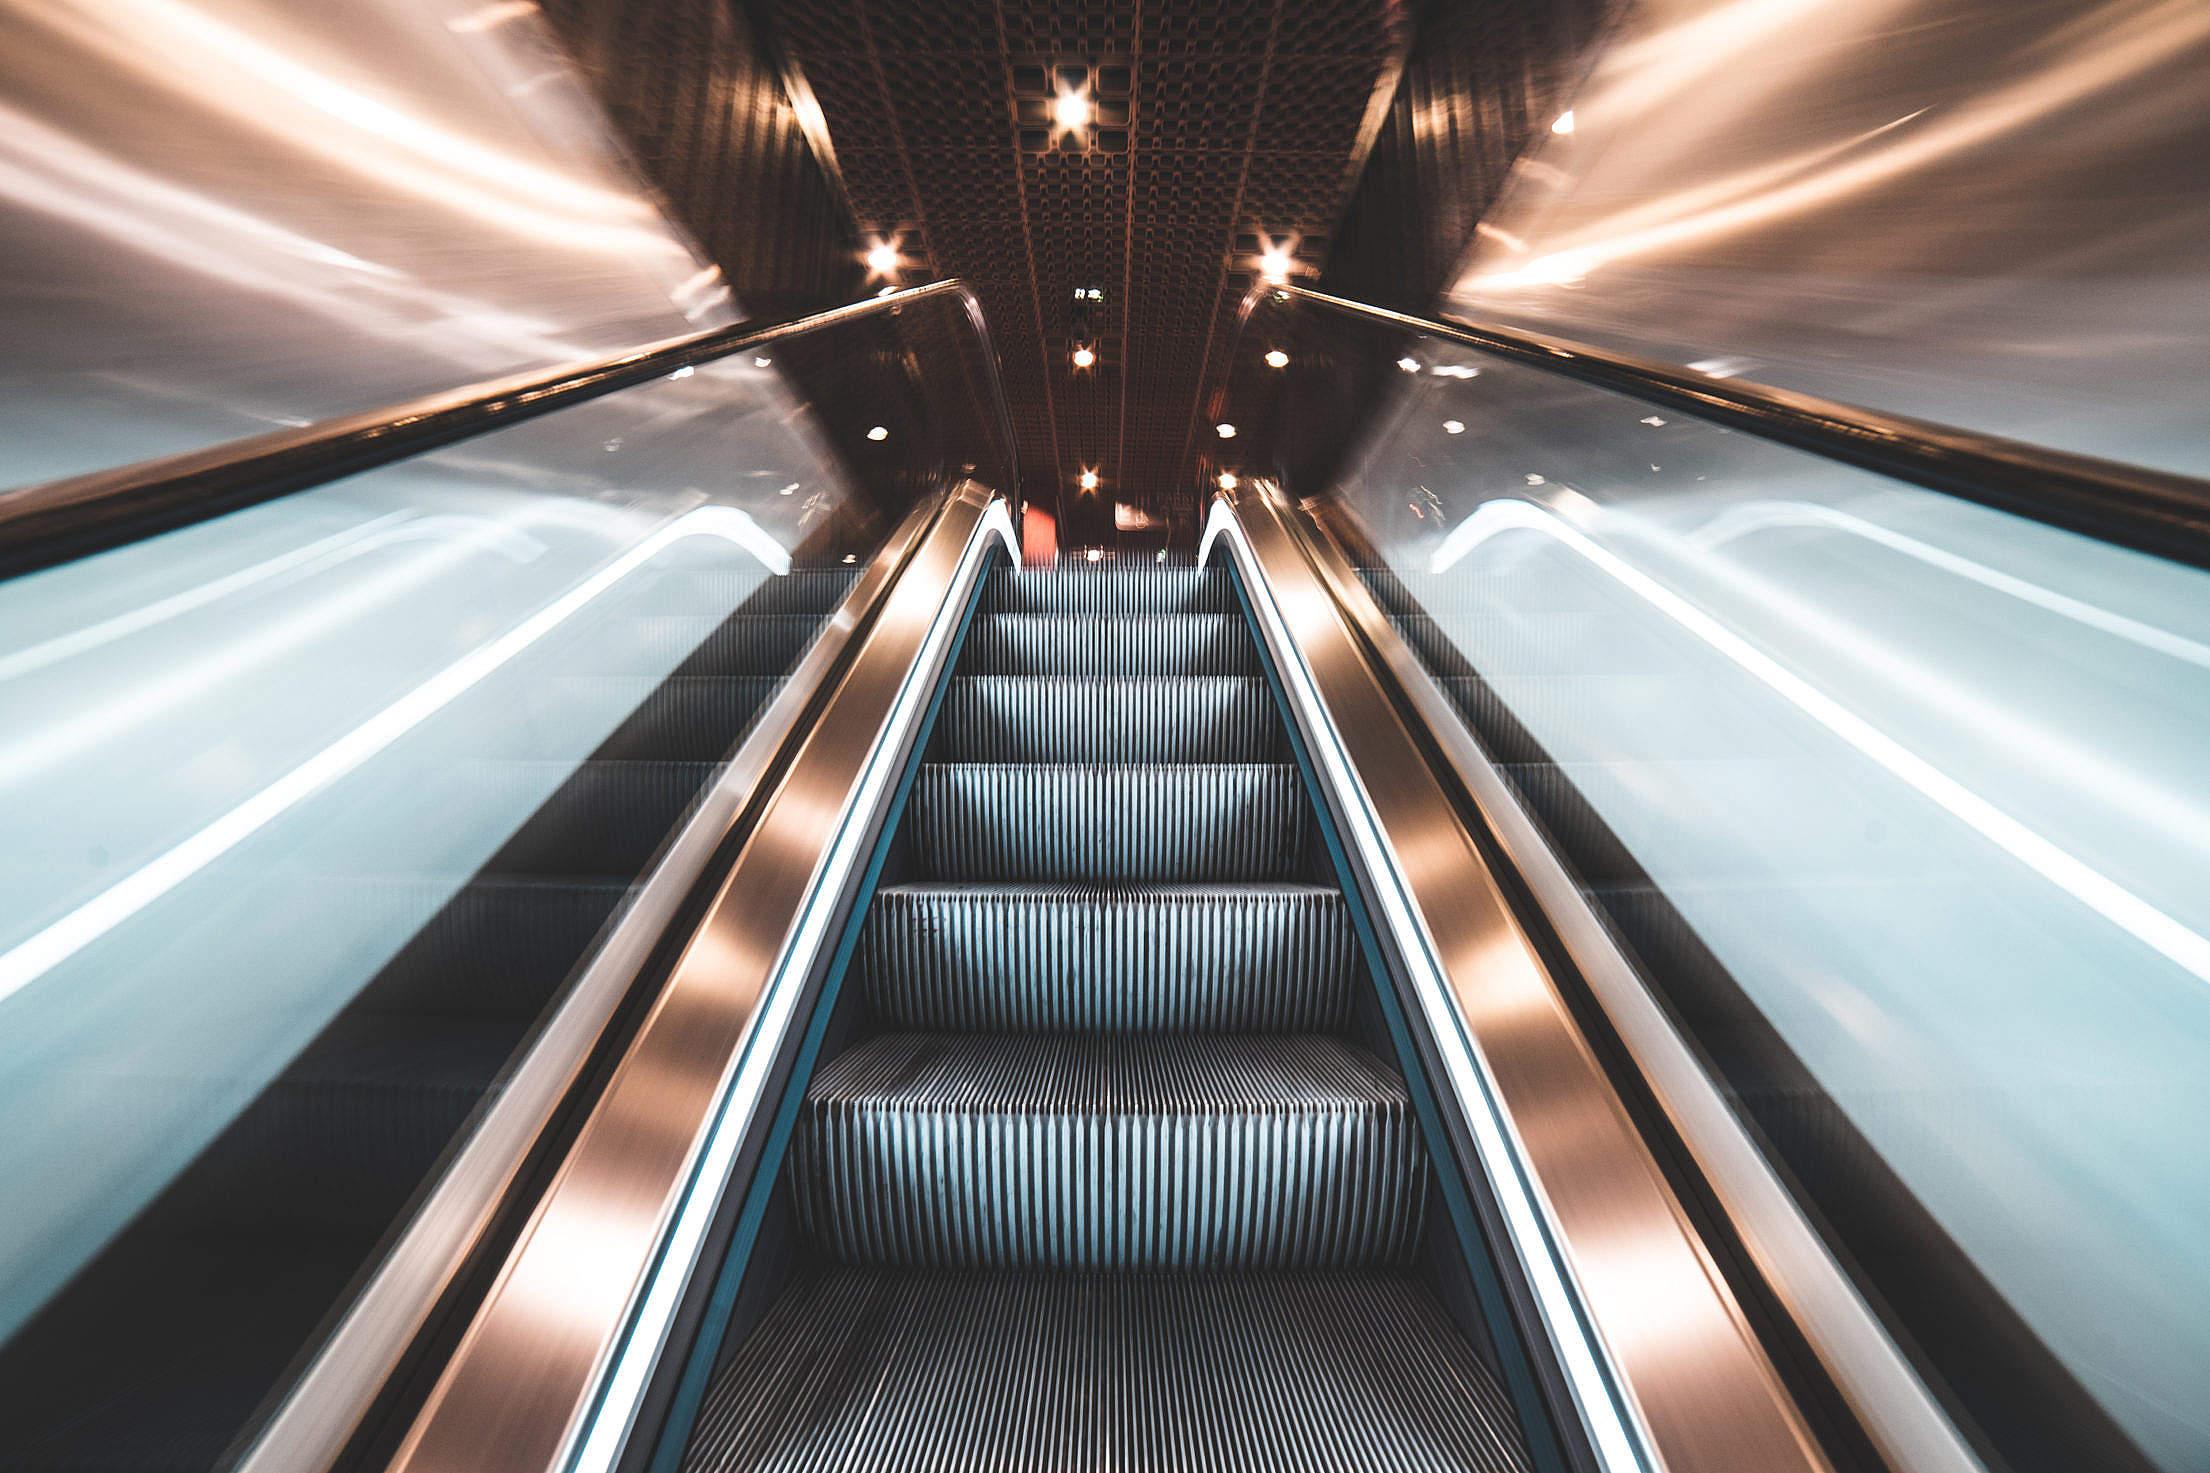 Fast Escalator Free Stock Photo